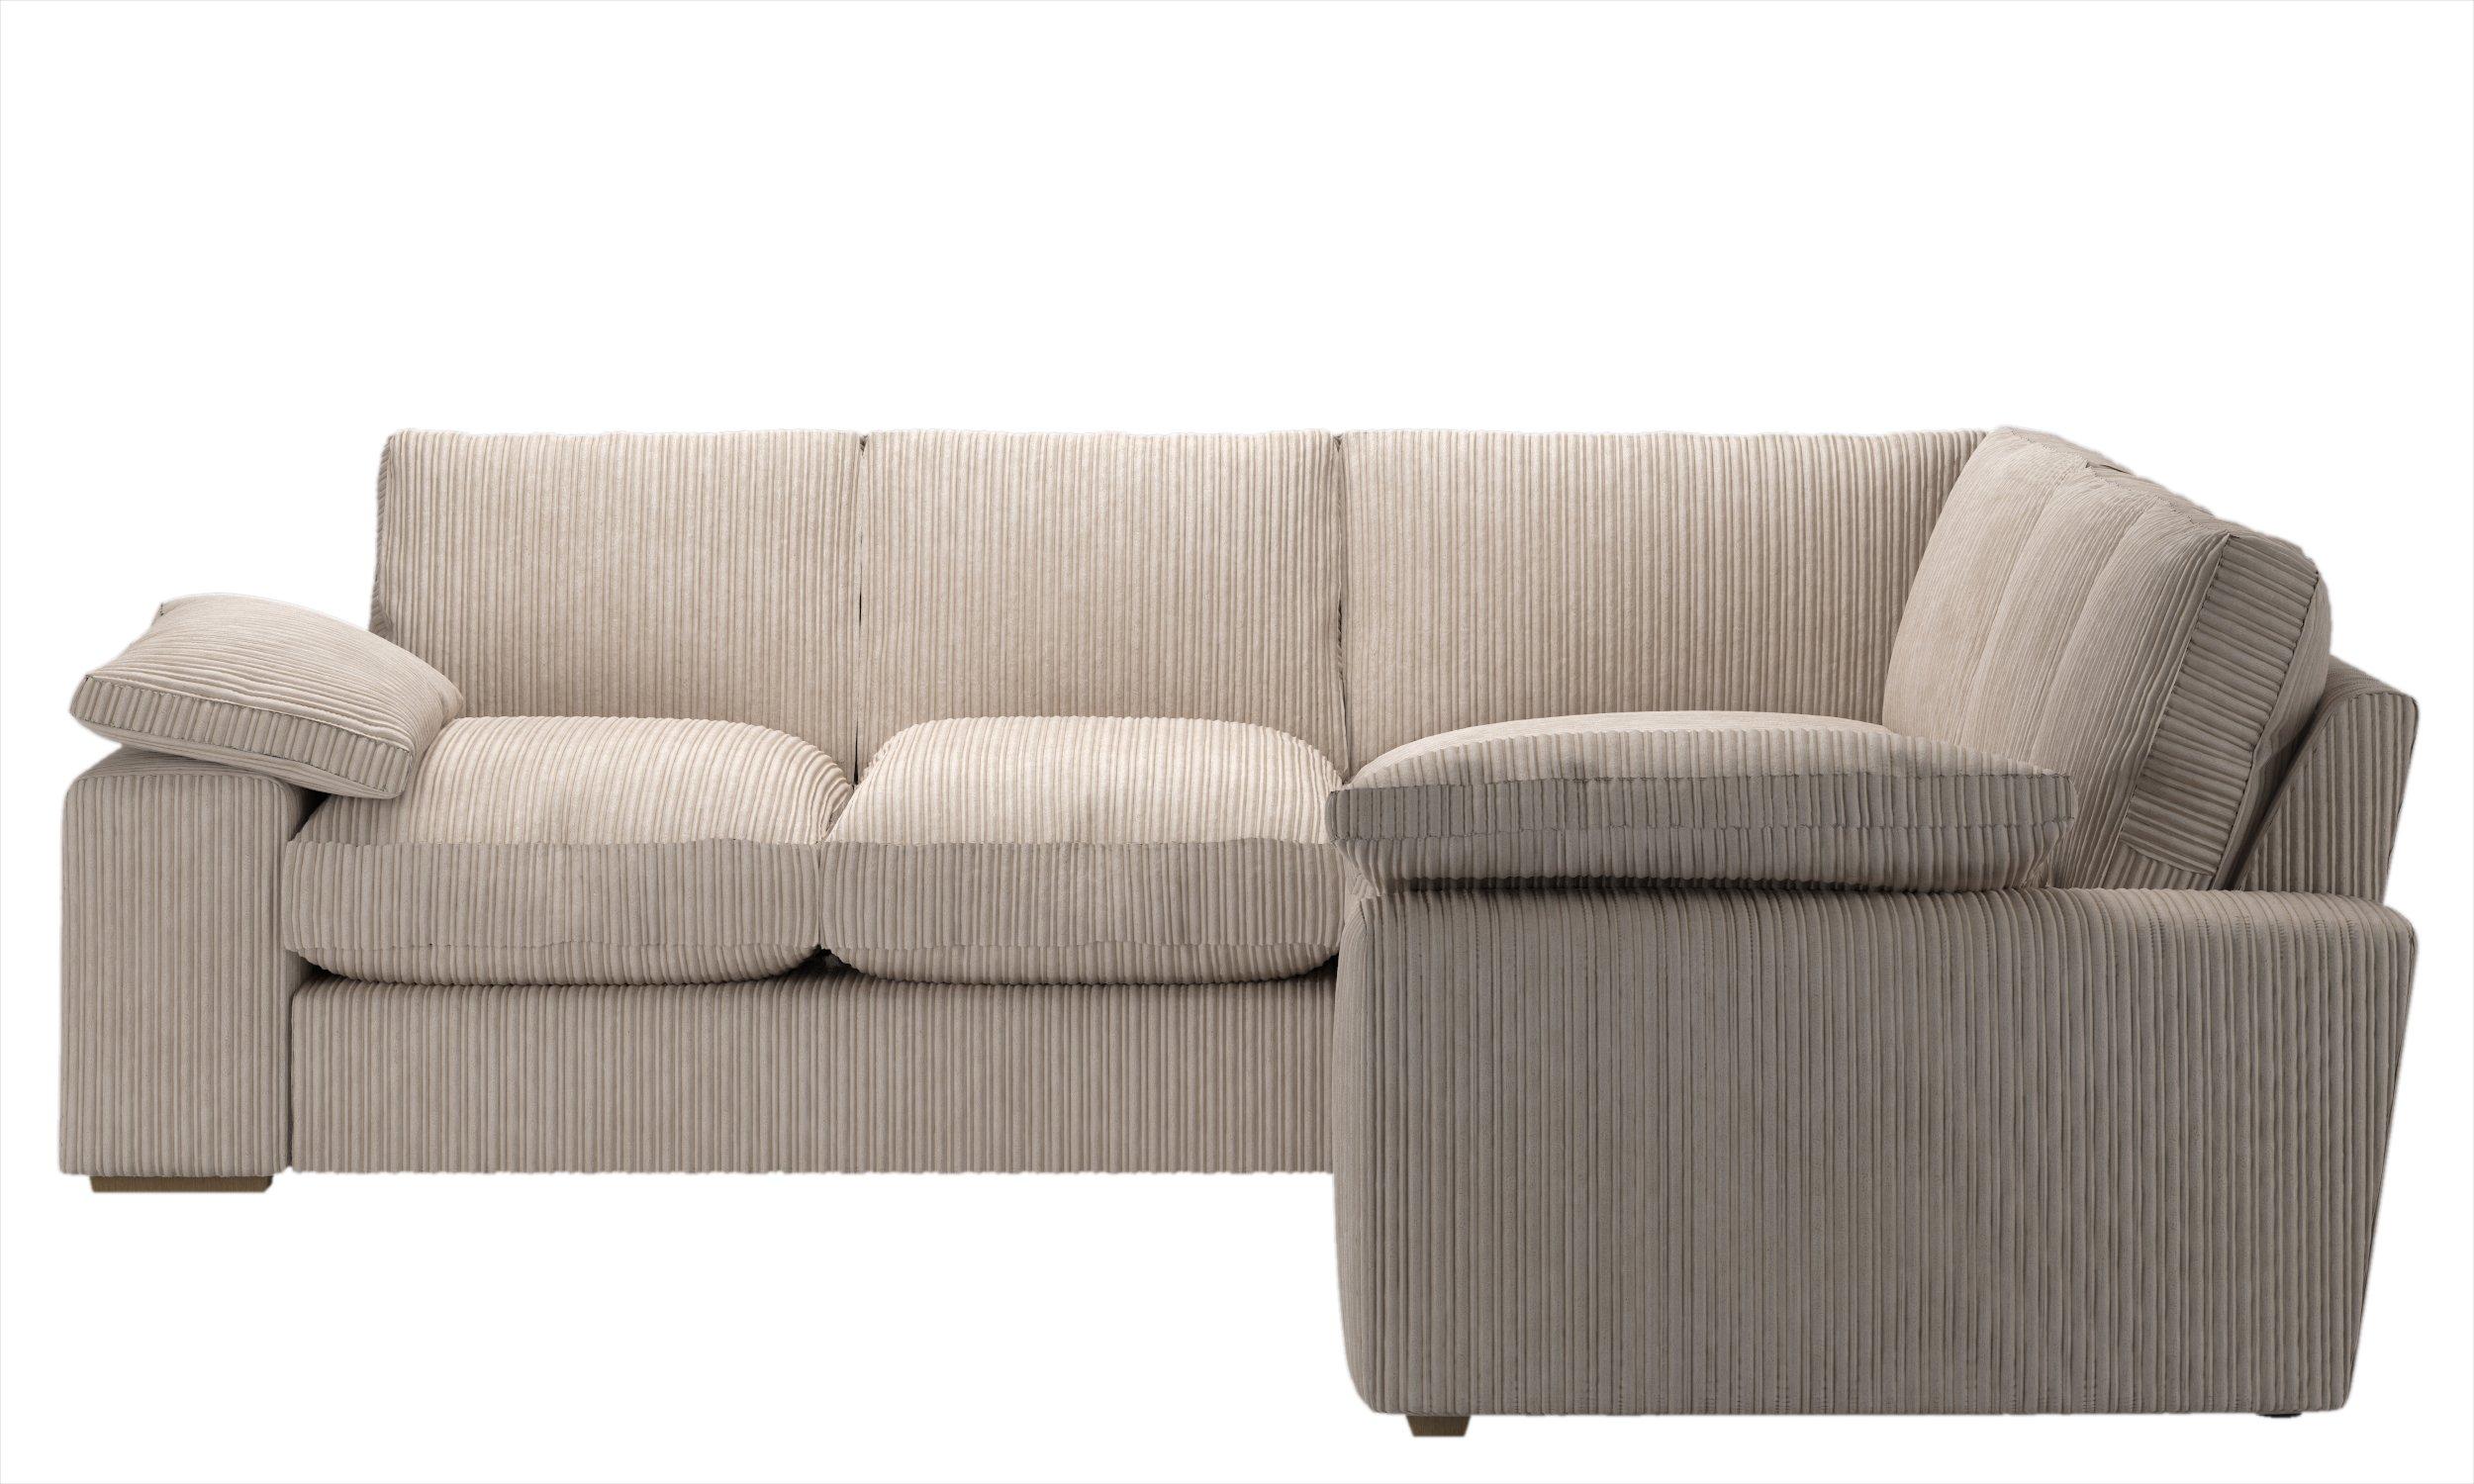 Collection - Phoebe Extra Large Dual Face Corner Sofa - Cream